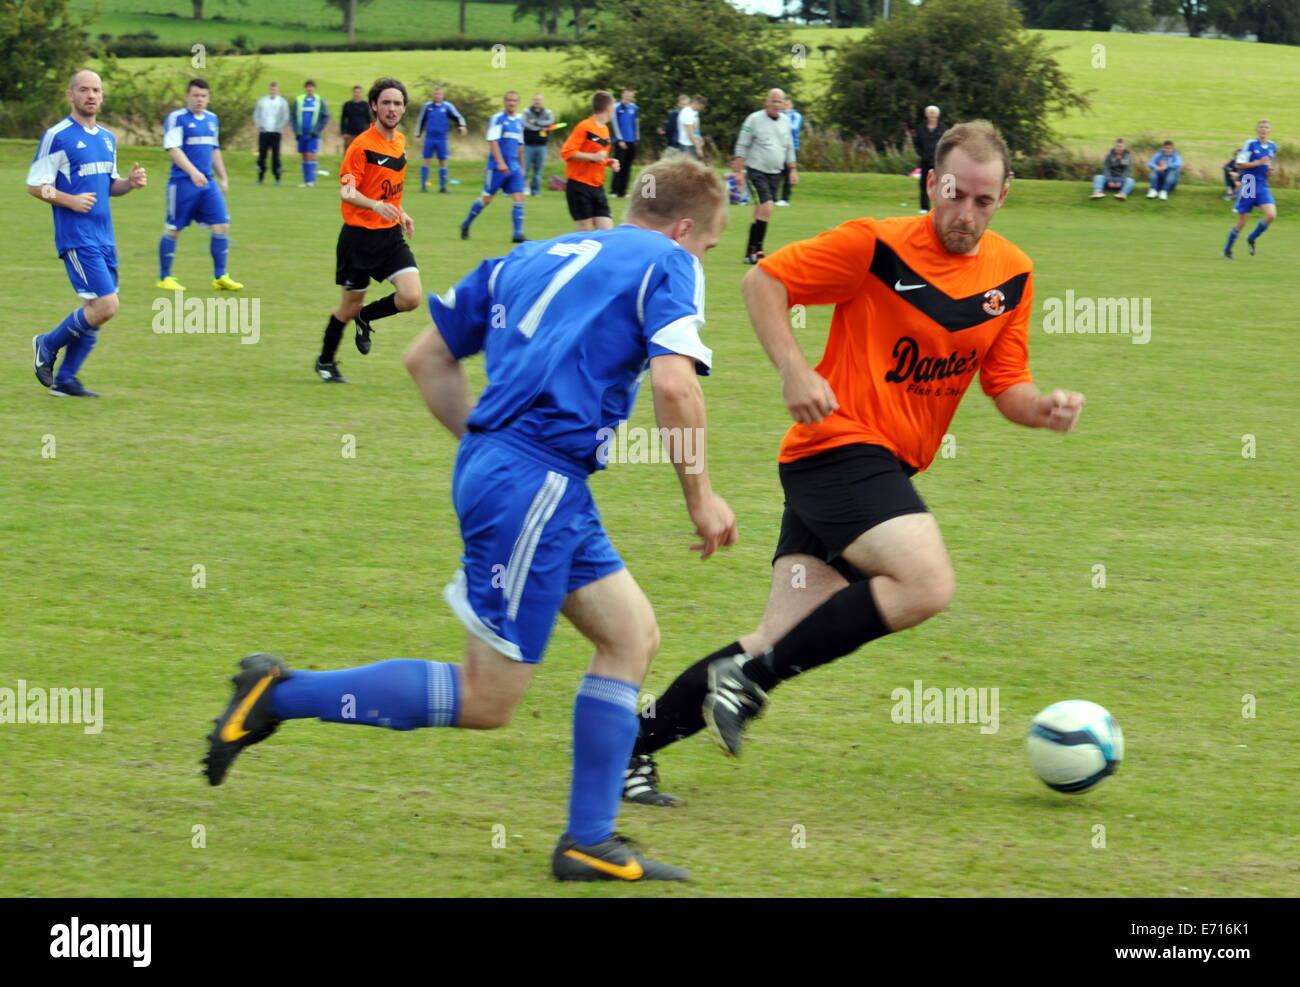 Sunday amateur league